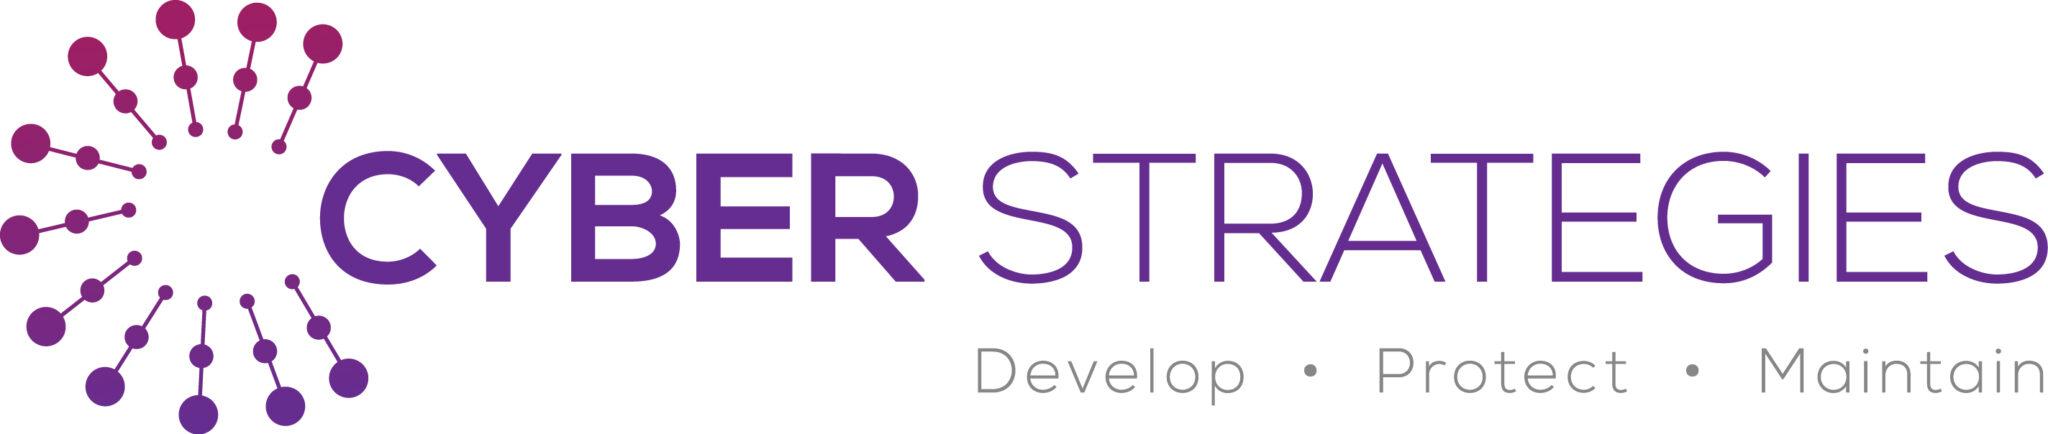 Cyber Strategies Logo